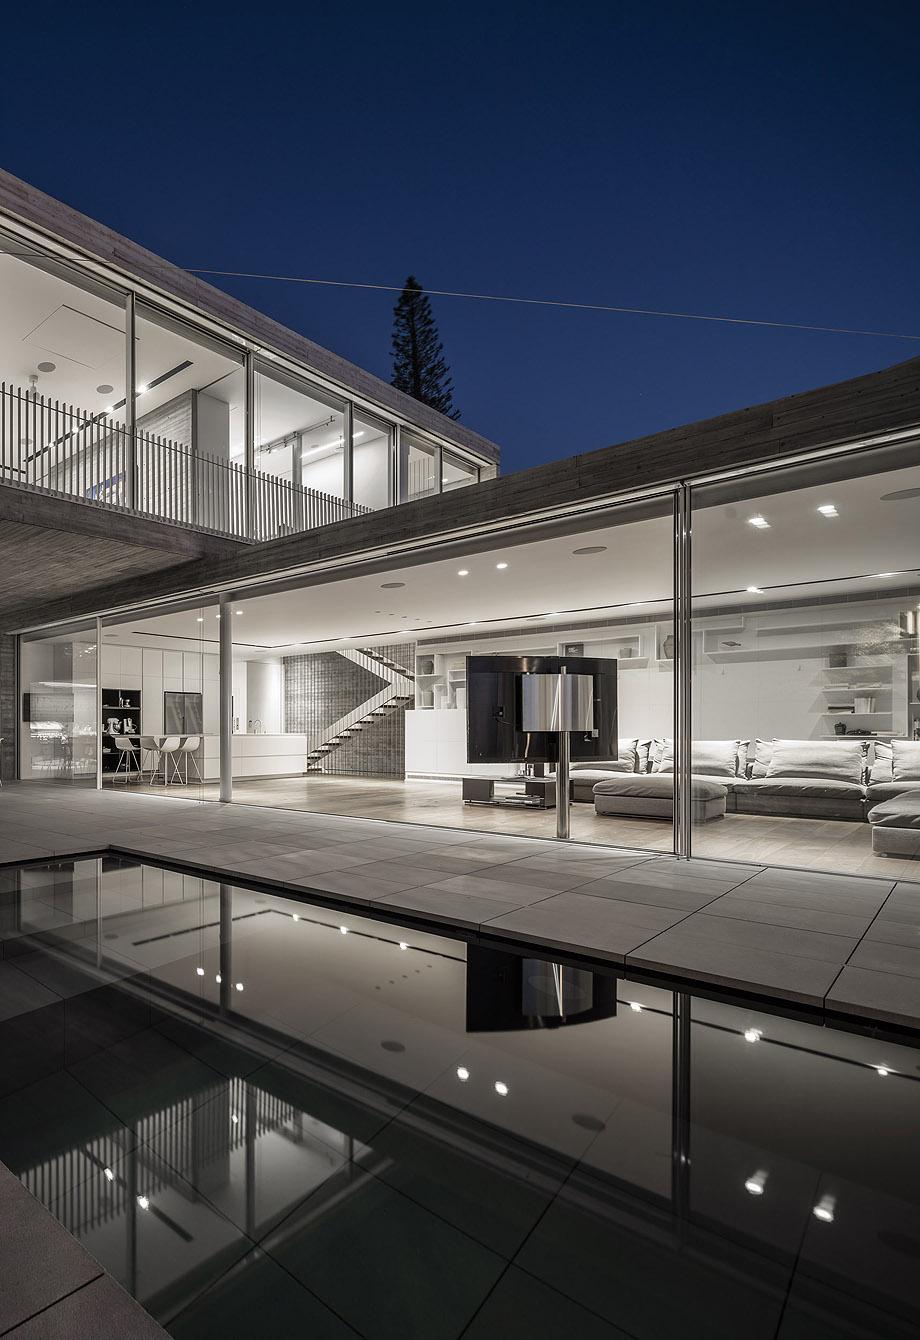 casa dual de axelrod architects (16)